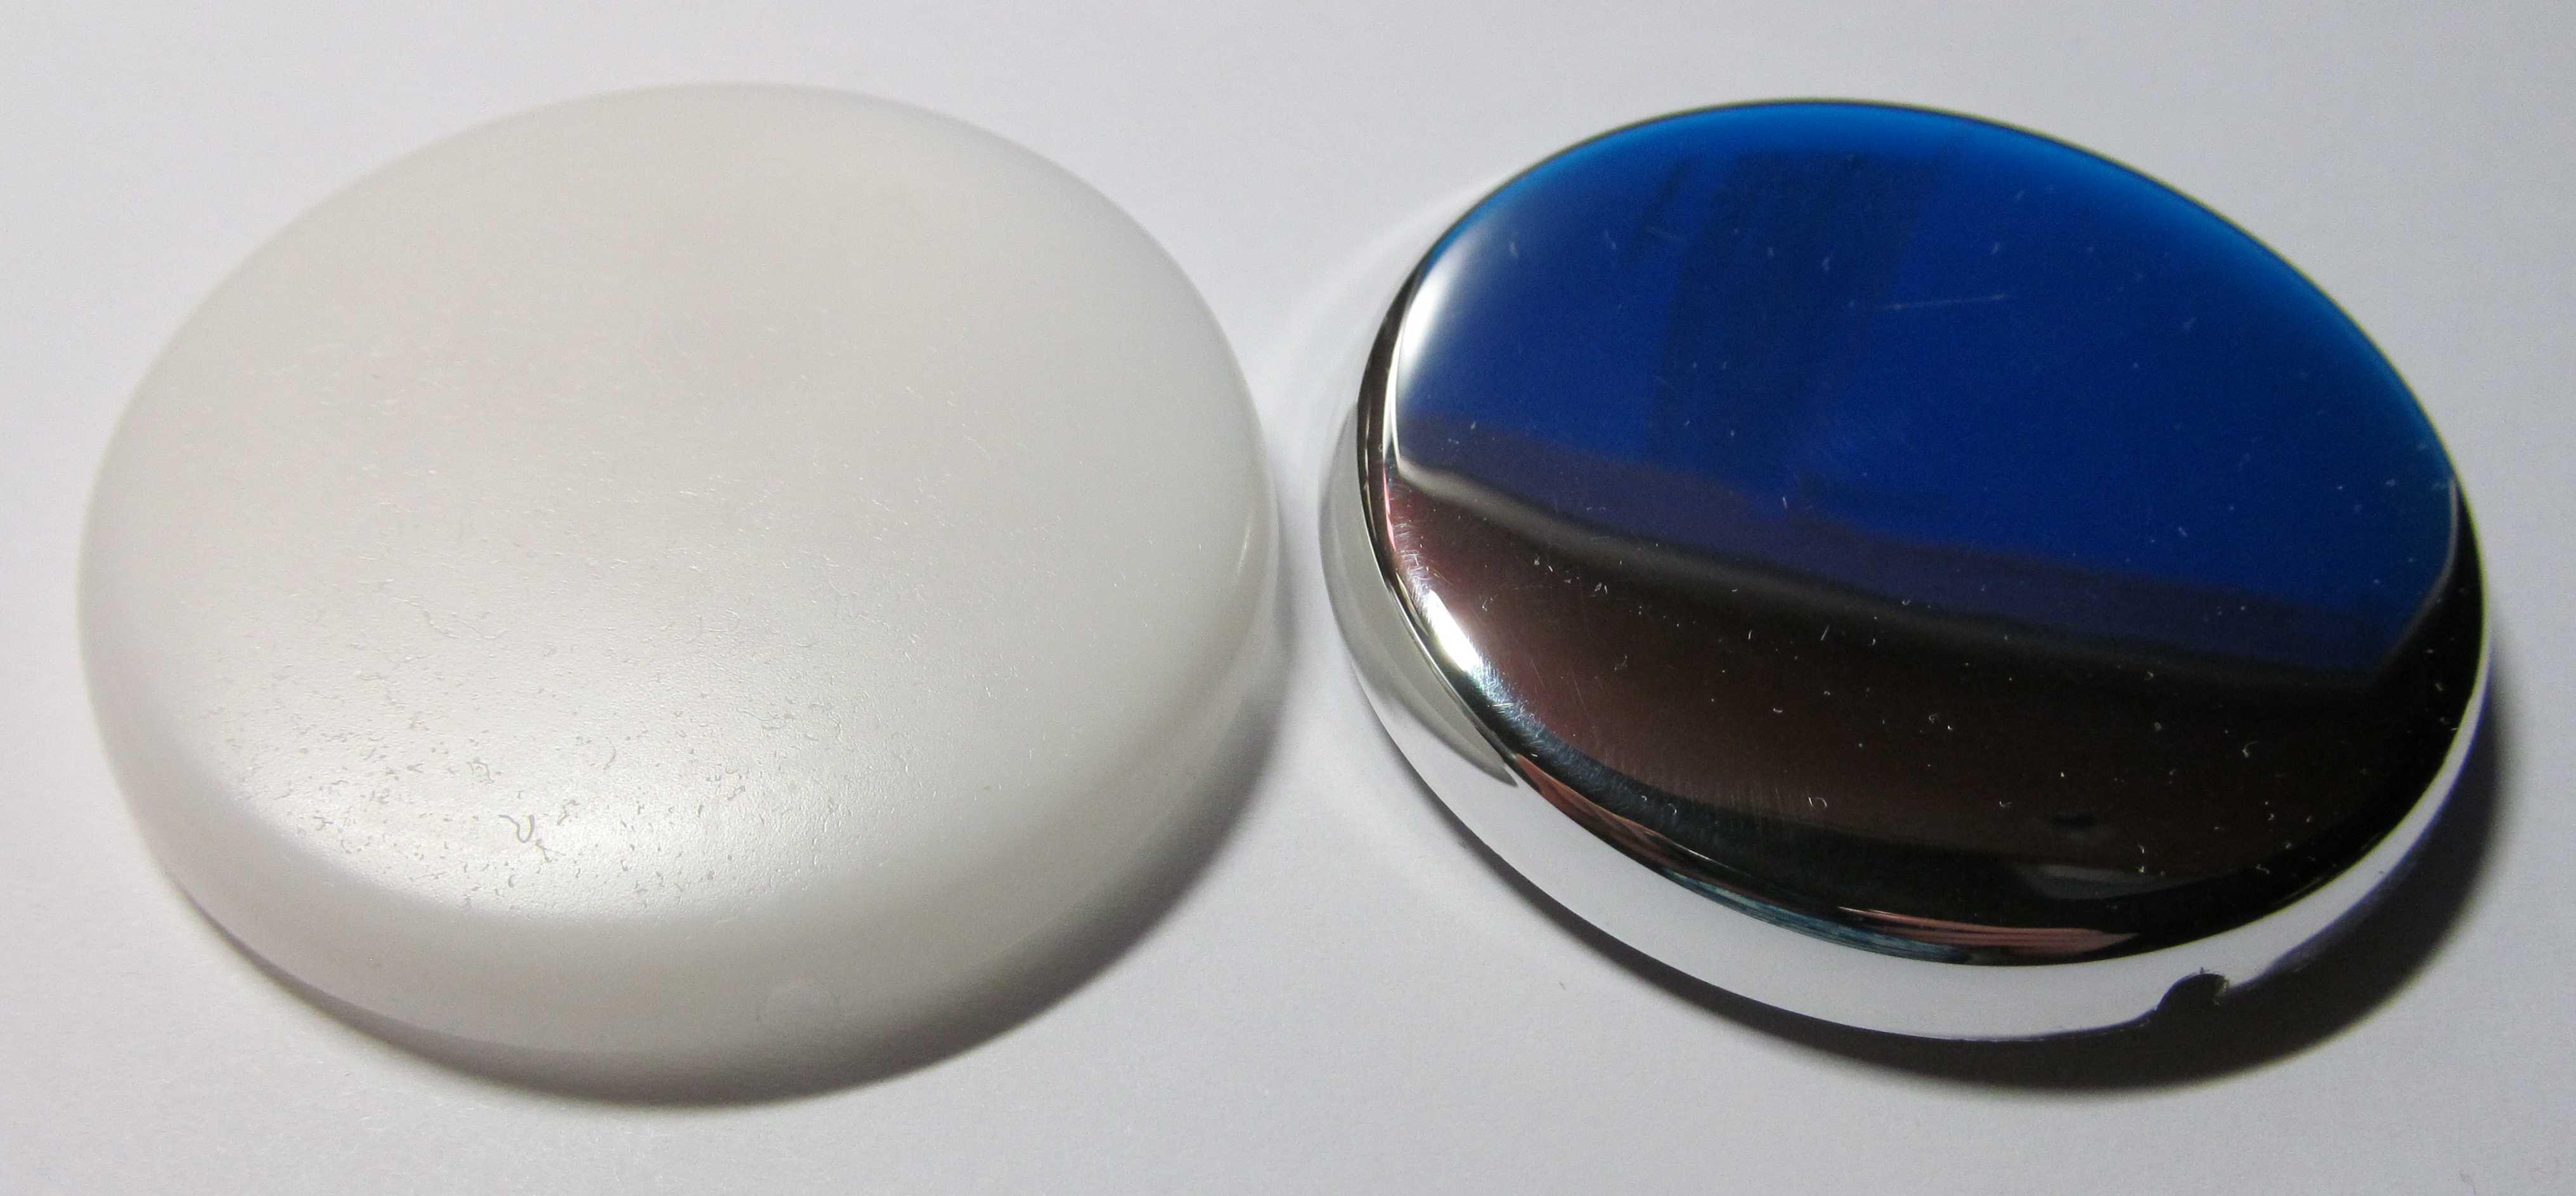 Отлитый из пластика корпус датчика Аквасторож (слева)